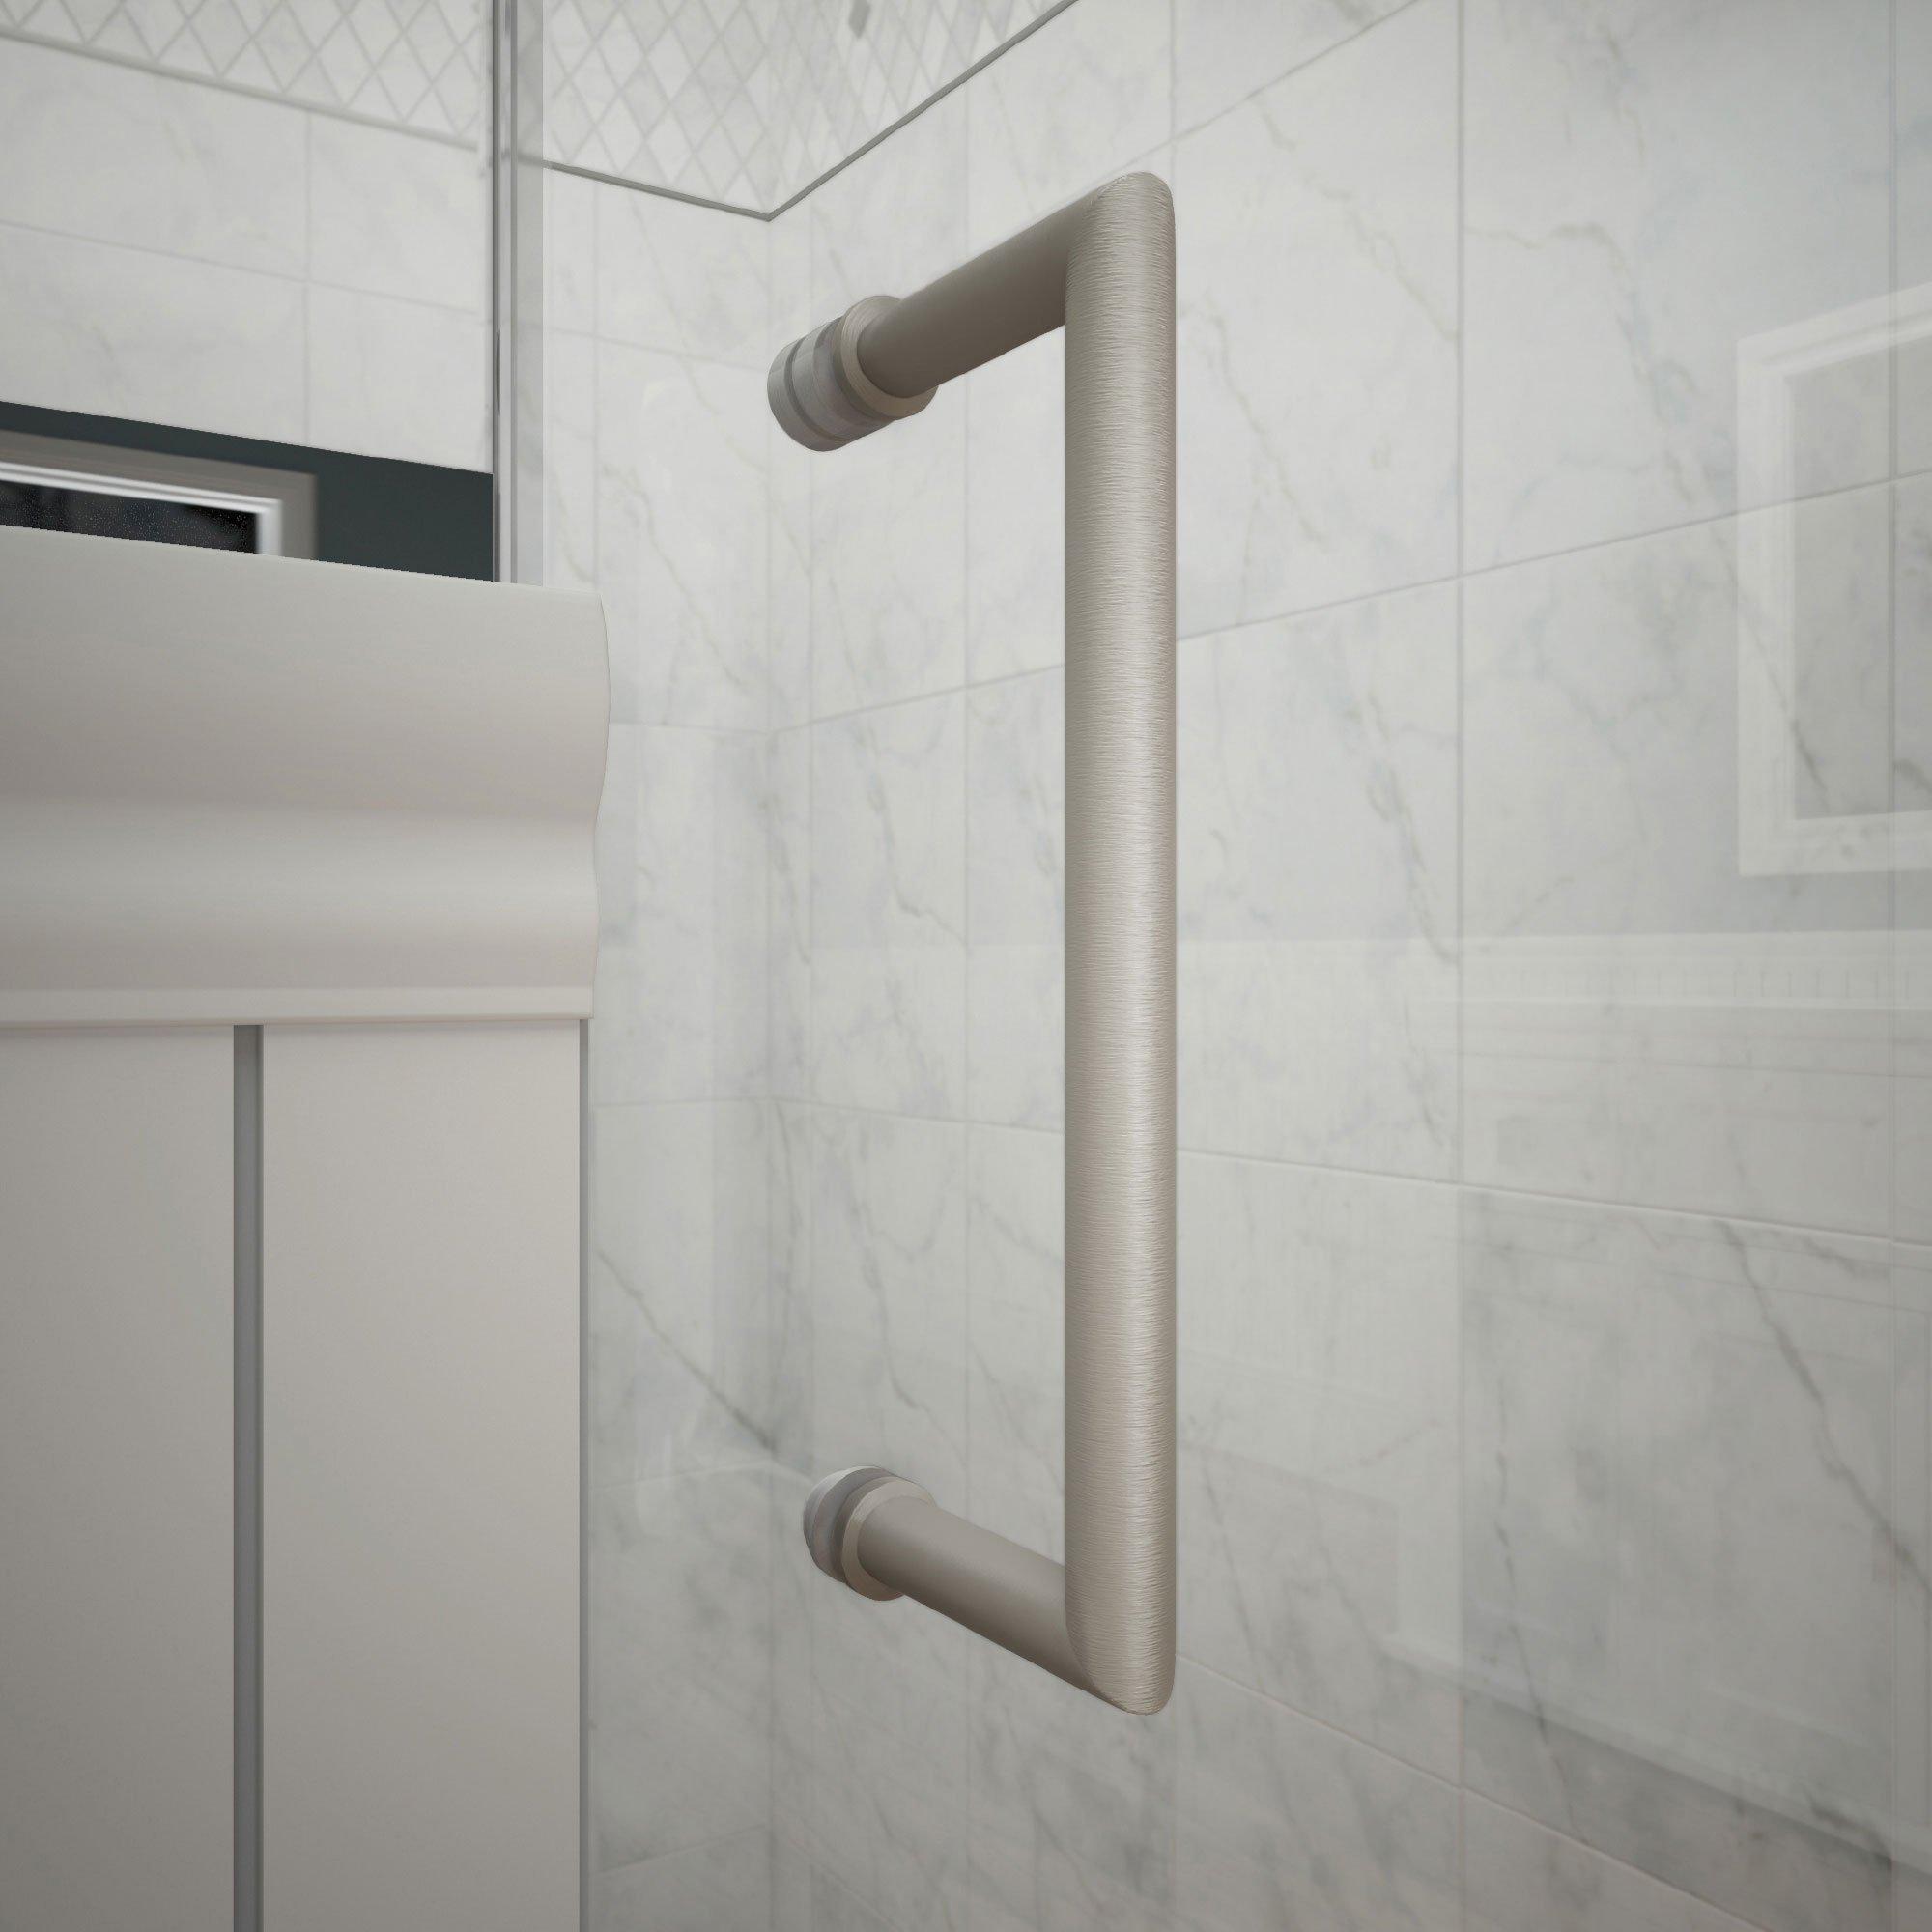 DreamLine Mirage-X 56-60 in. Width, Frameless Sliding Shower Door, 3/8'' Glass, Brushed Nickel Finish by DreamLine (Image #4)